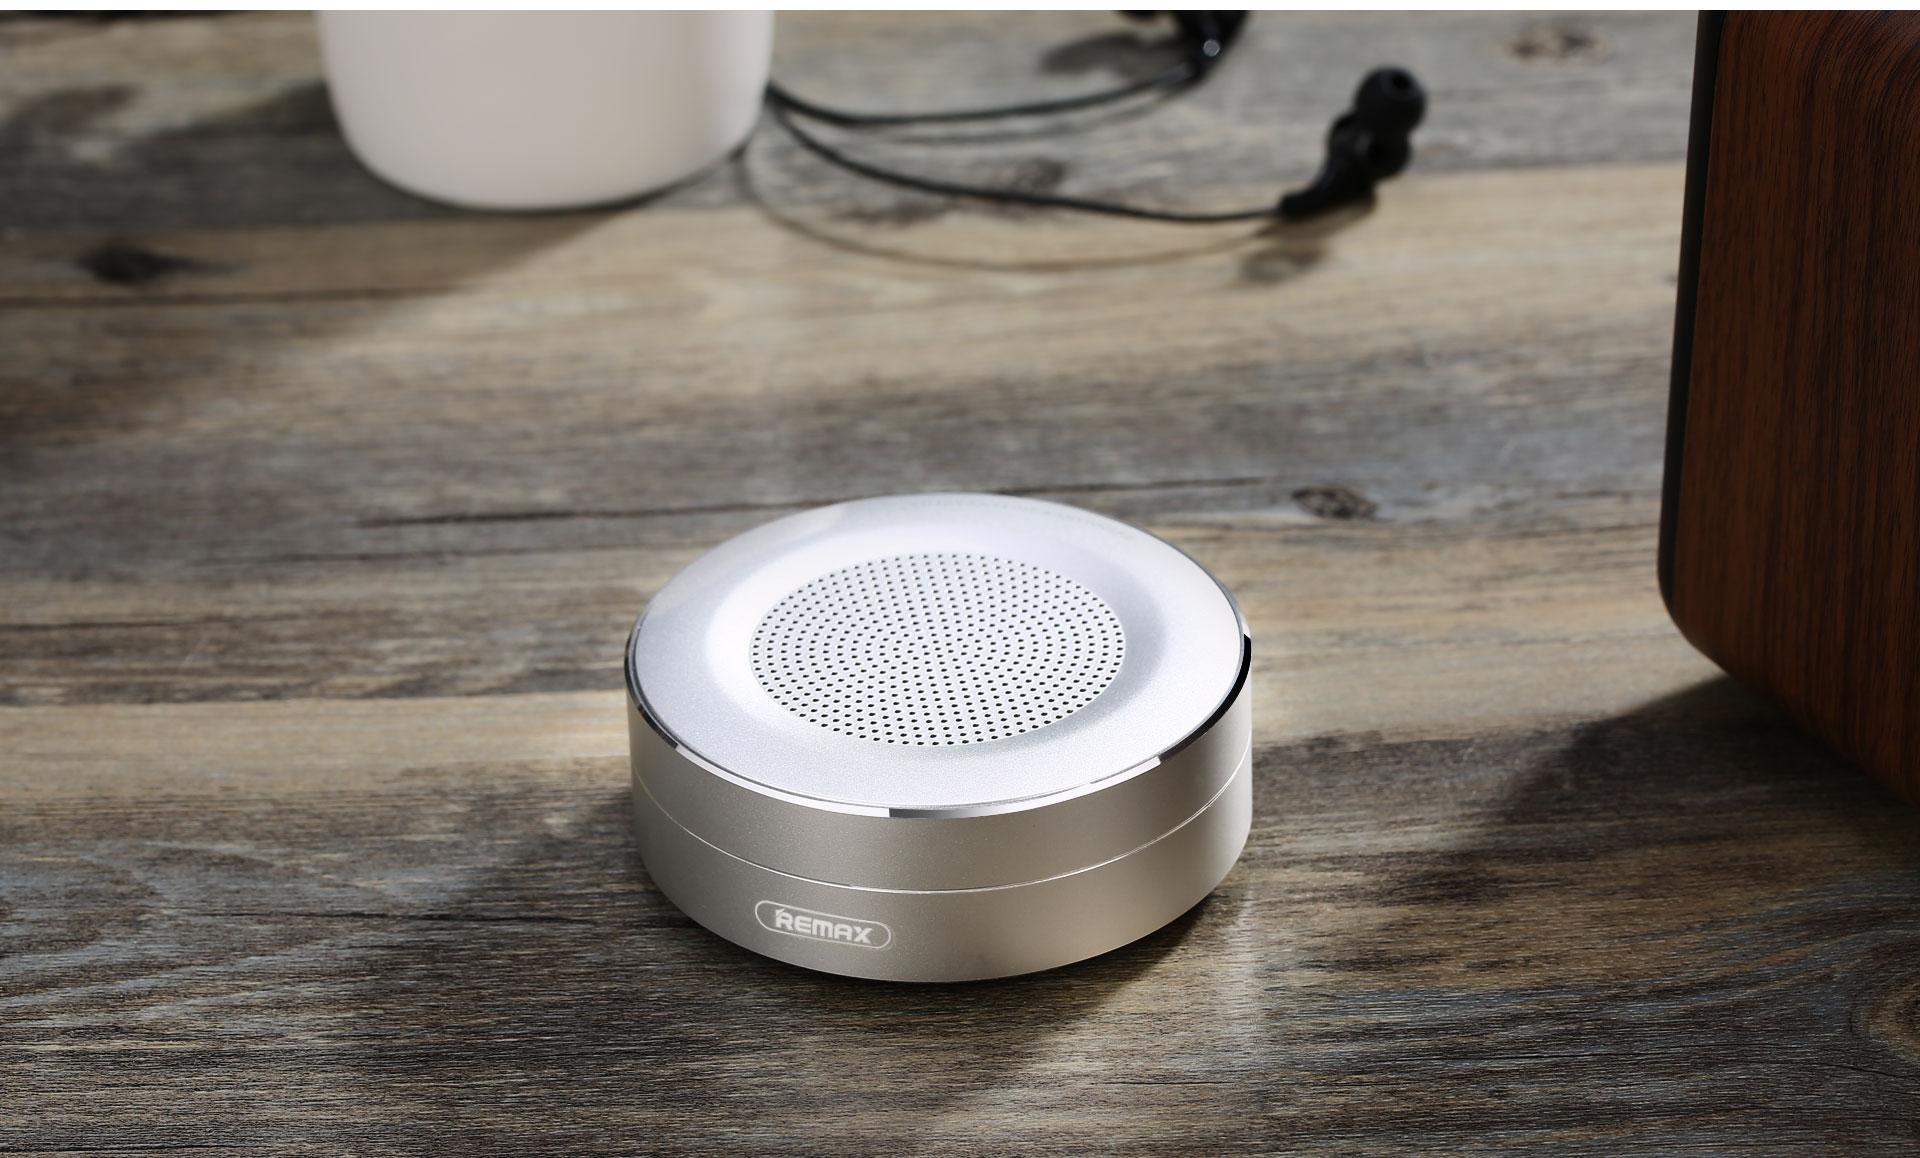 HTB1hAwJjH1YBuNjSszhq6AUsFXaU Remax Bluetooth Portable Speaker RB-M13 - Black